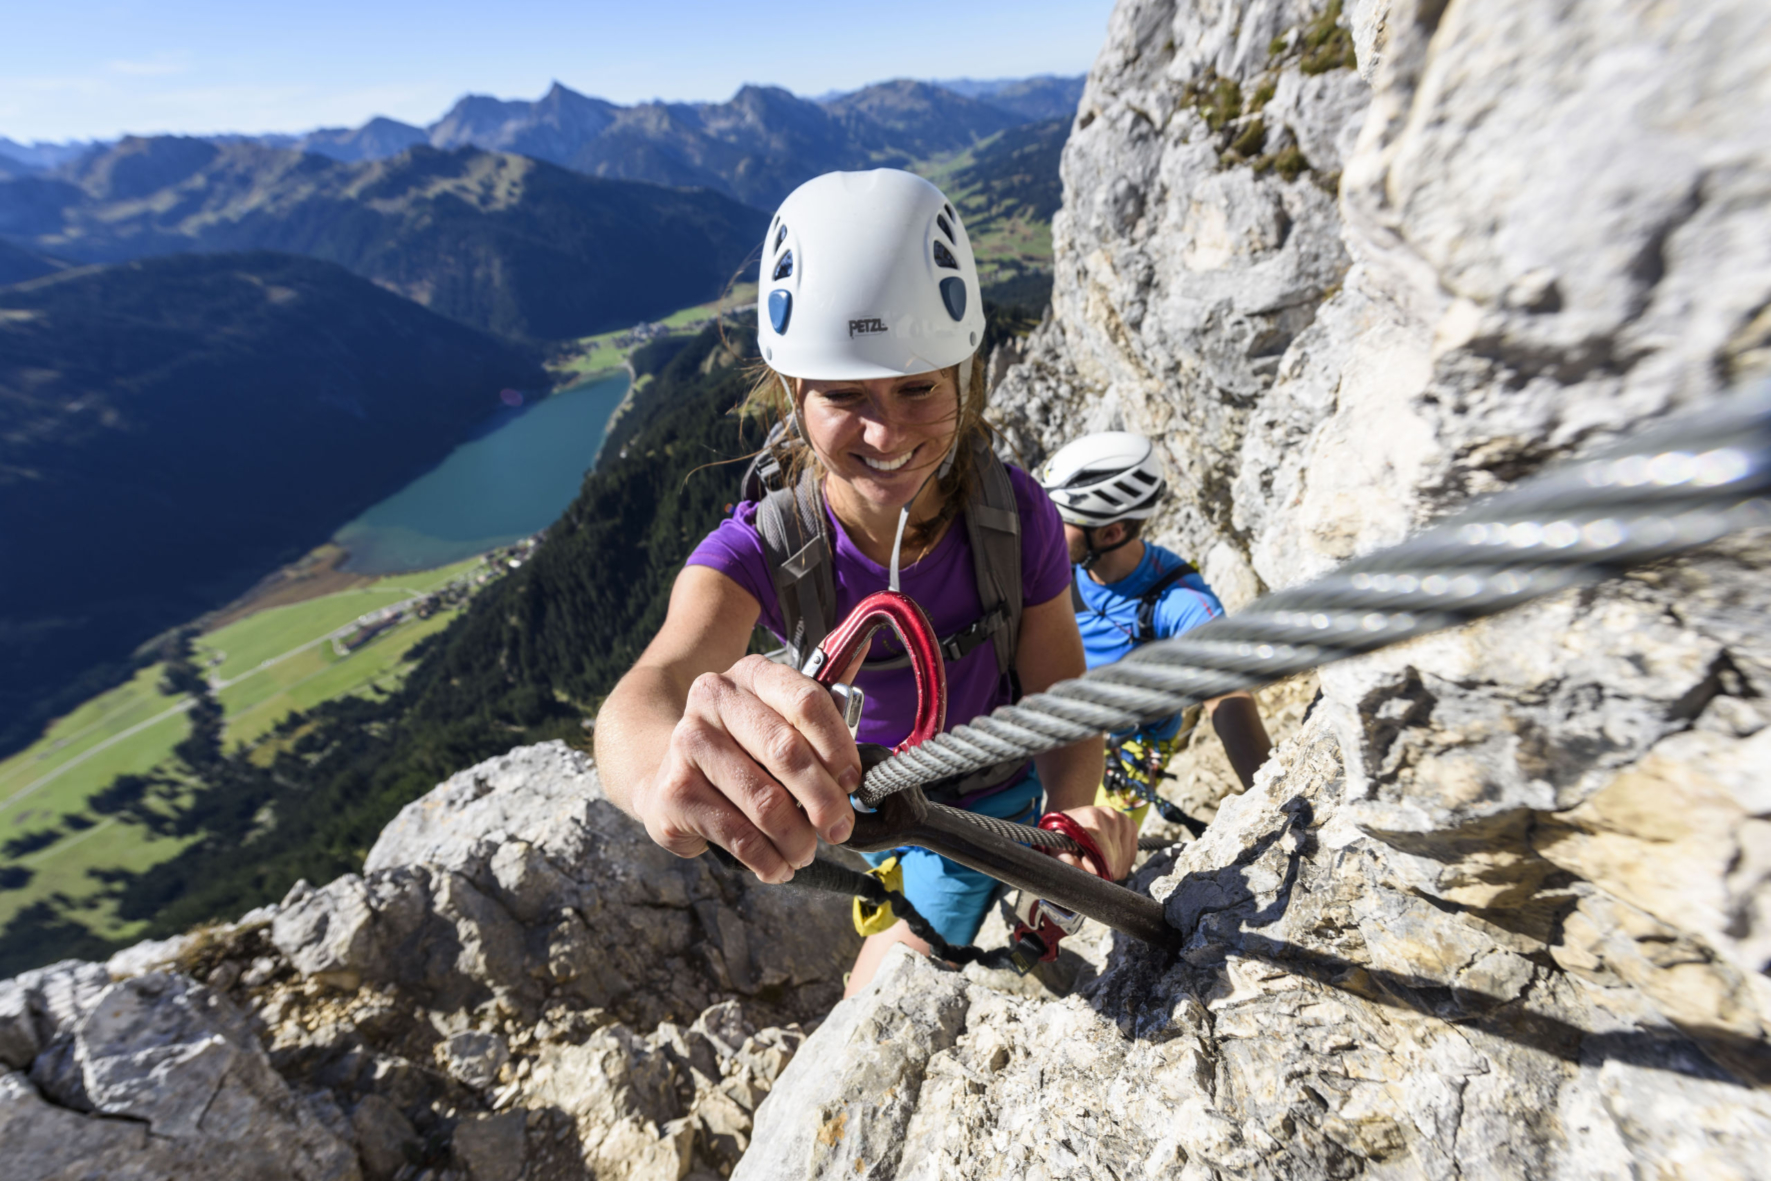 Klettersteig im Tannheimer Tal, Foto: TVB Tannheimer Tal I Climbers Paradise